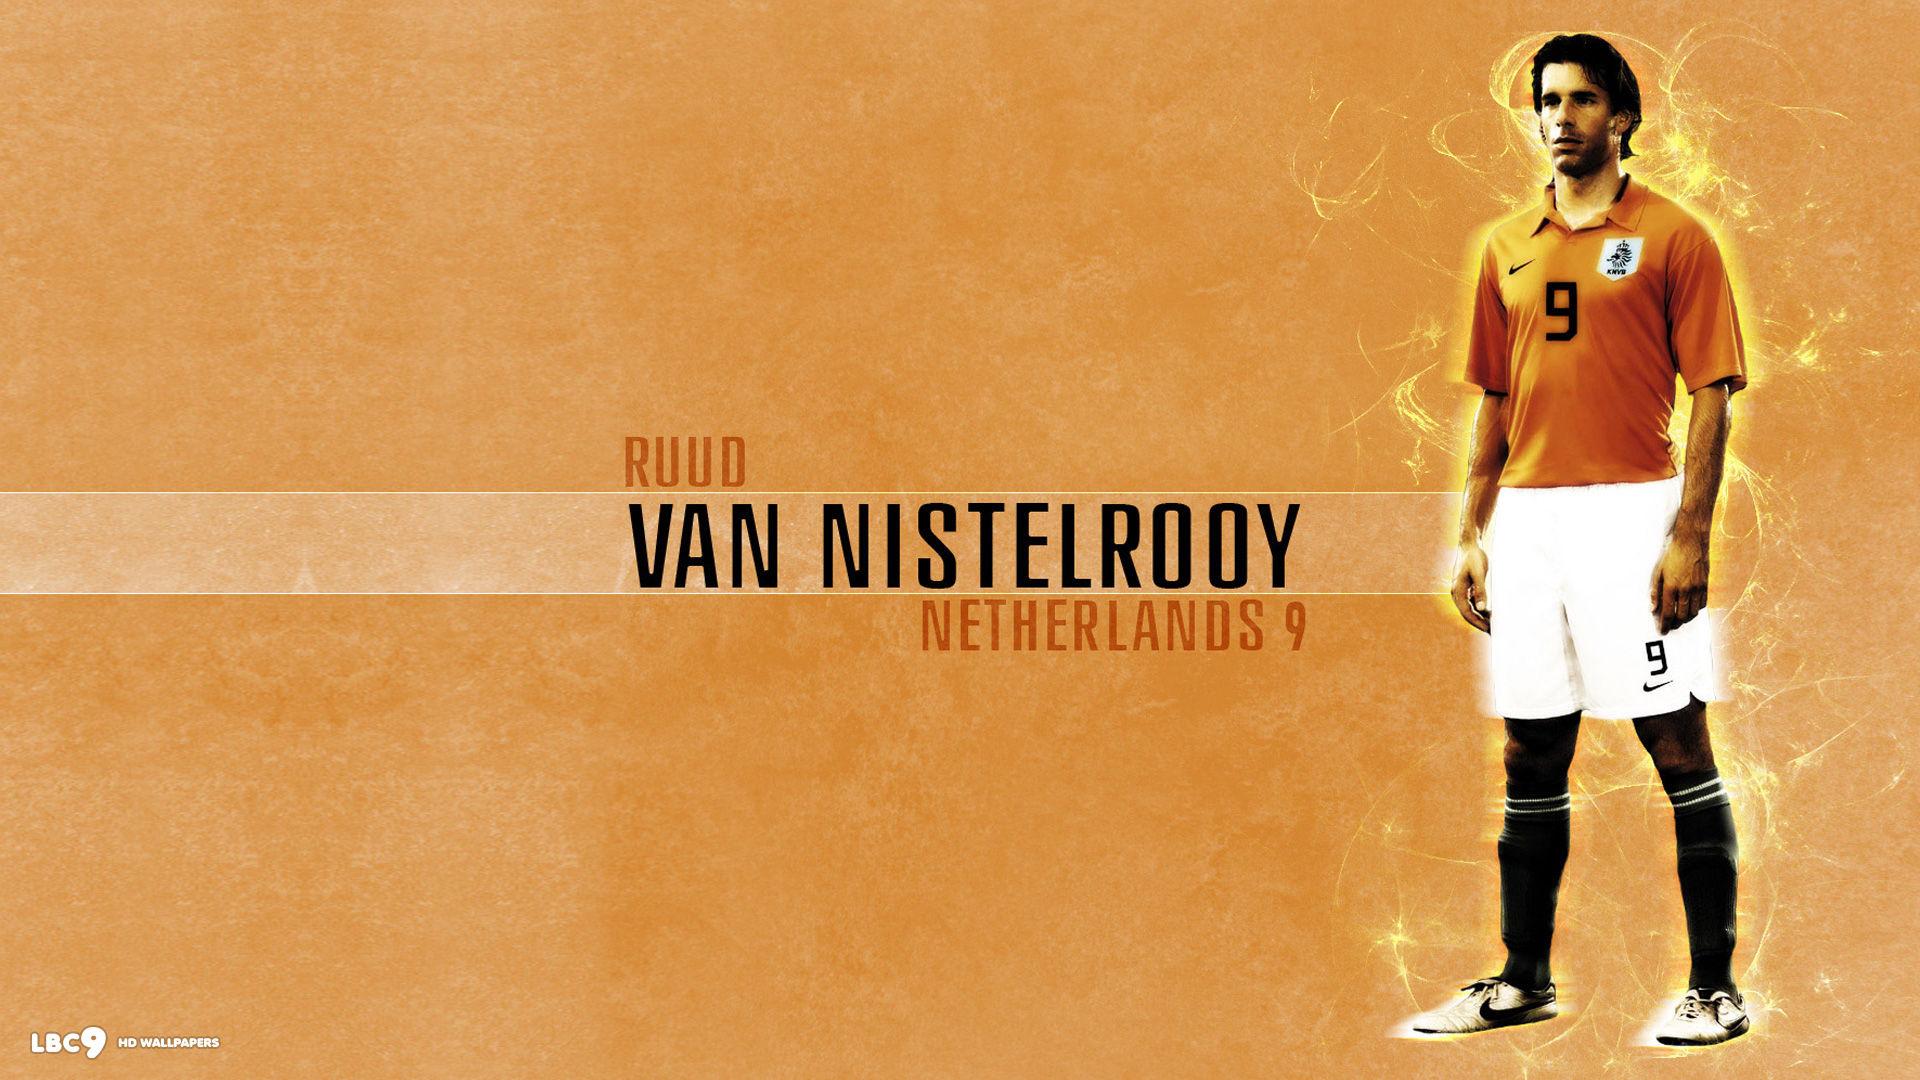 ruud van nistelrooy wallpaper 67 players hd backgrounds 1920x1080